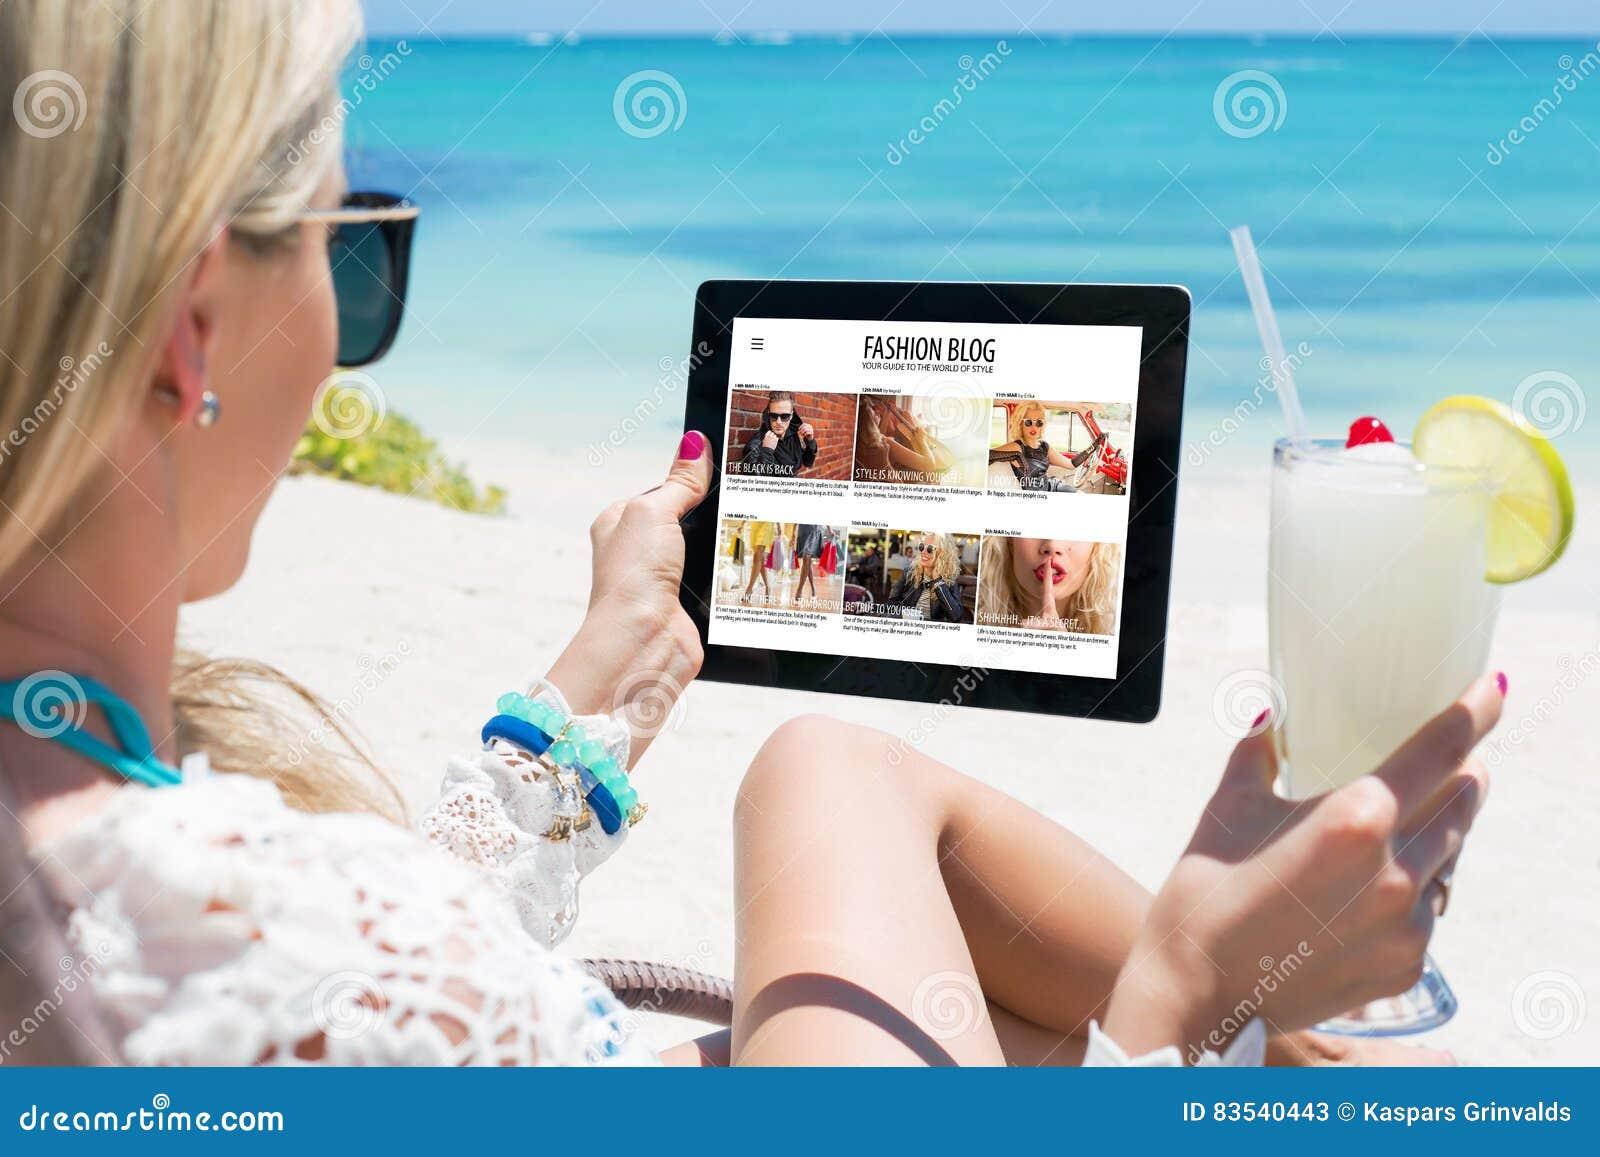 Woman reading fashion blog